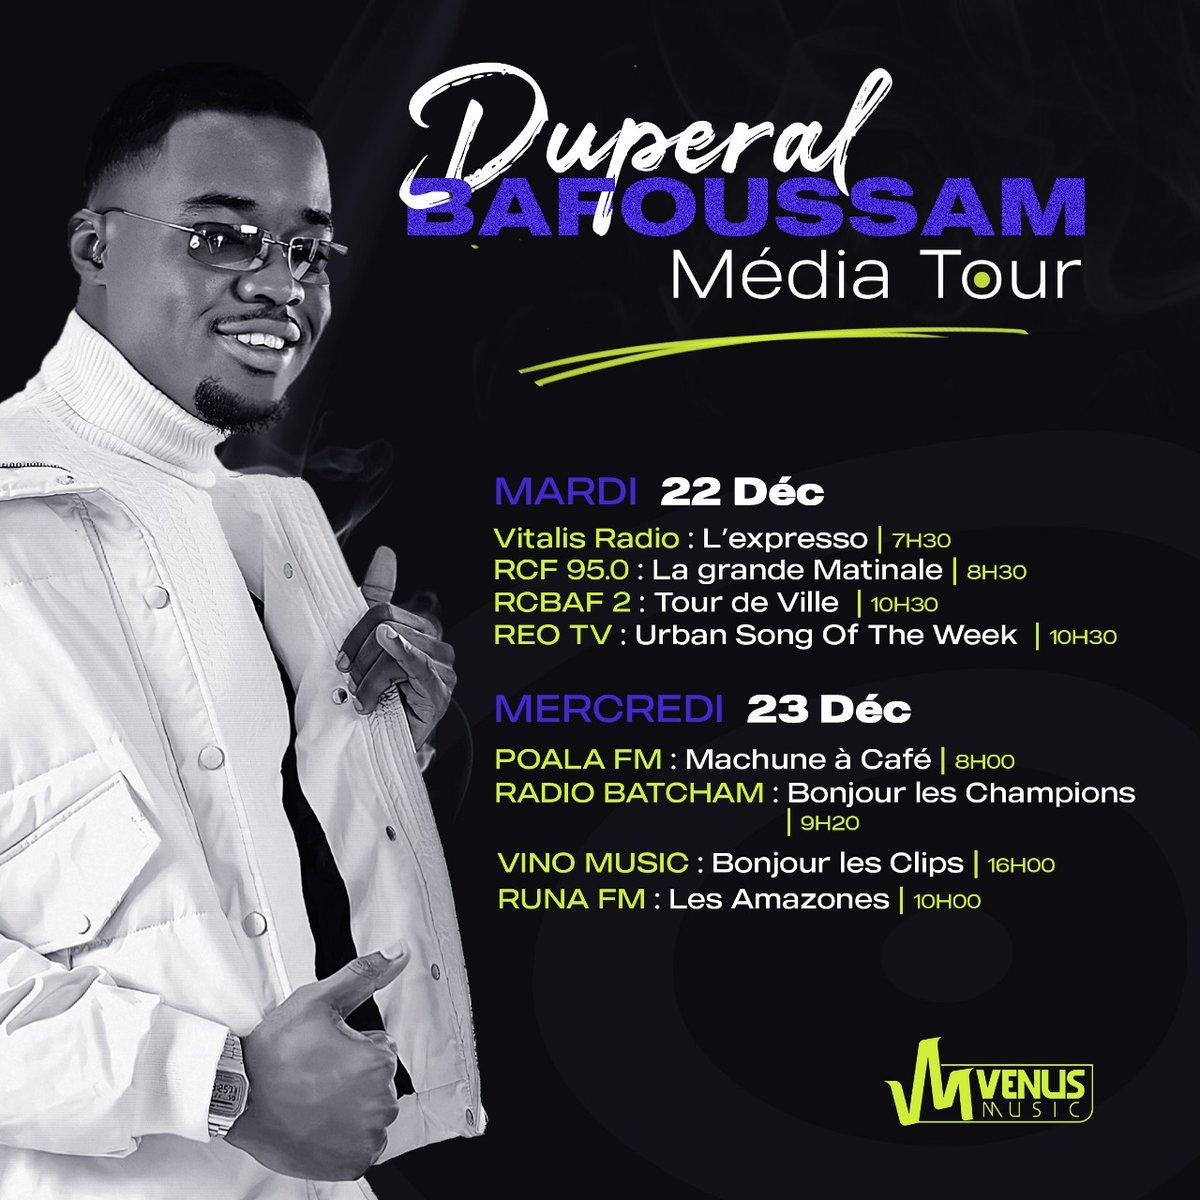 Bafoussam : Je suis là ✌🏿  #Duperal #CestComplique #MediaTour #Team237 #VenusMusic #Bafoussam #Cameroun